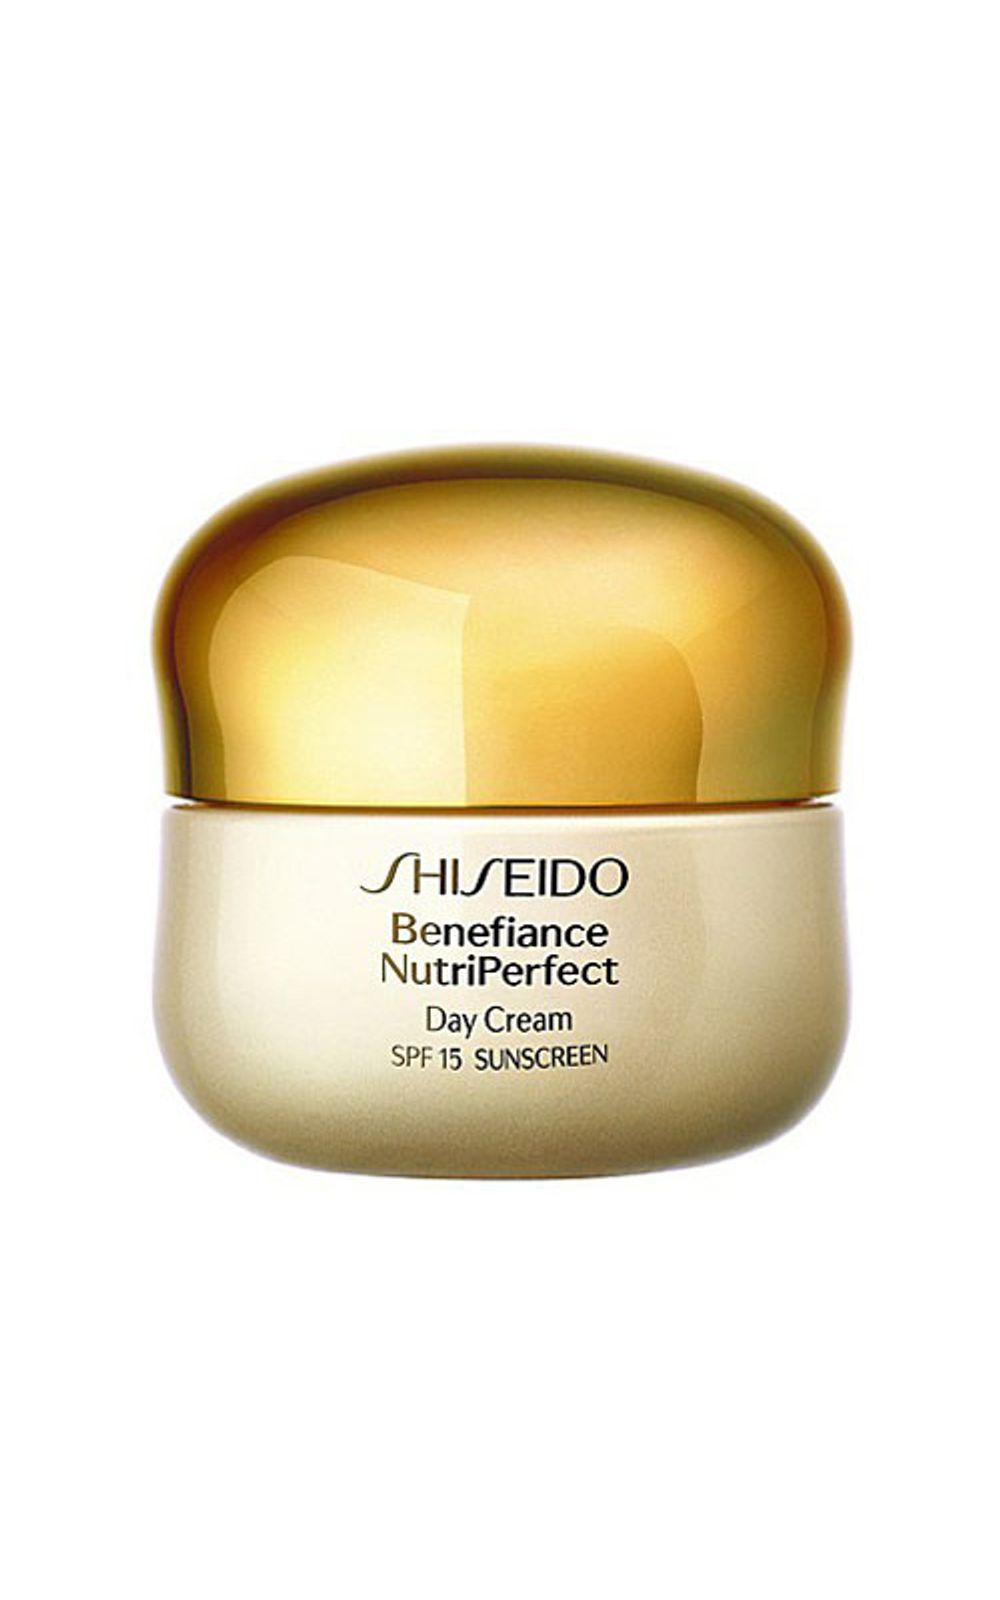 Foto 1 - Creme Nutritivo para peles Maduras Shiseido Benefiance Nutriperfect Day Cream Spf15 - 50ml